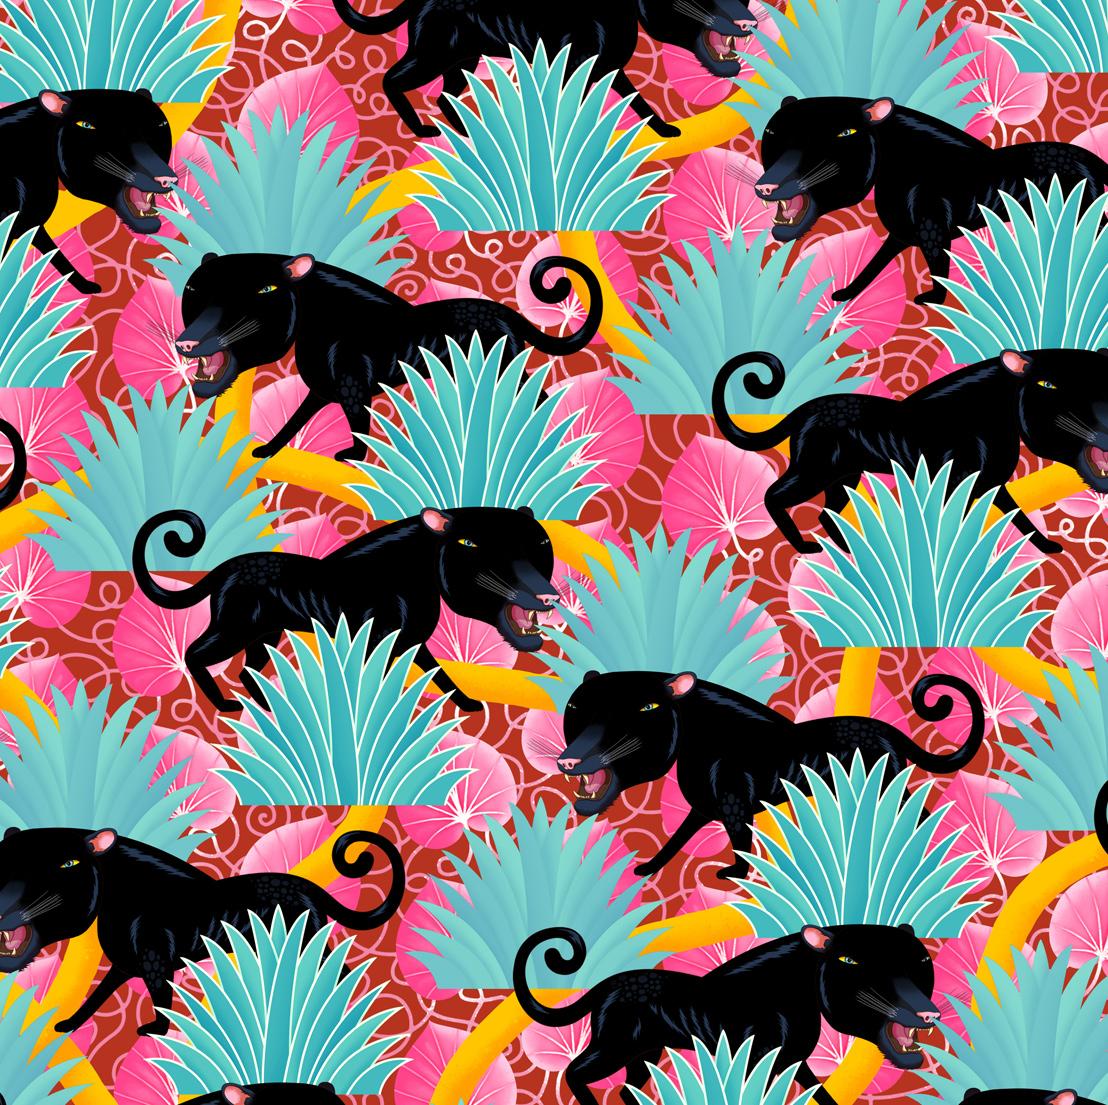 black panther repeat pattern.jpg